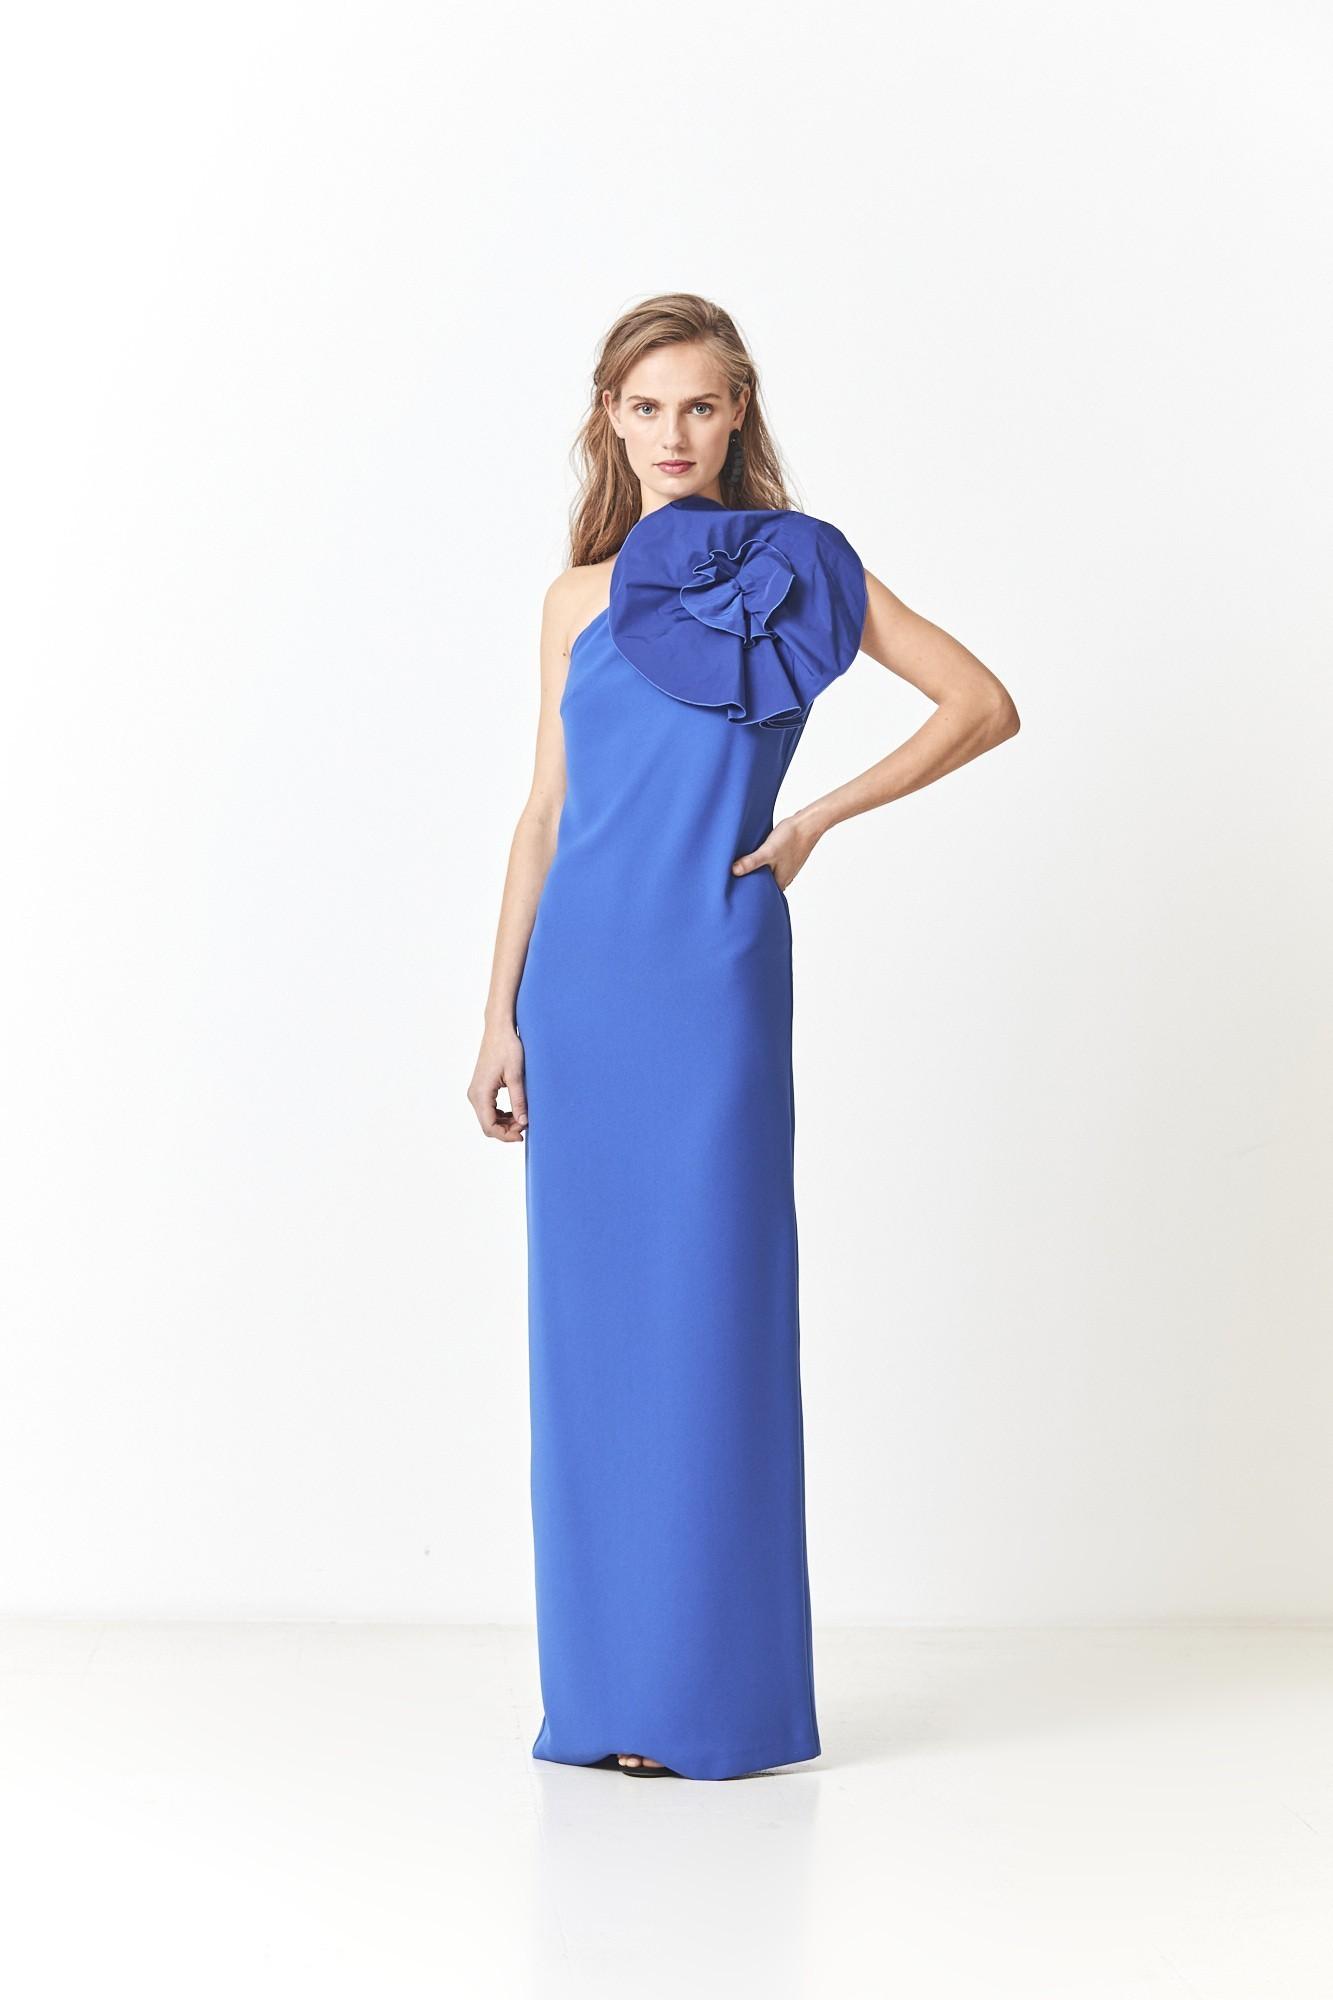 ROSETON DRESS